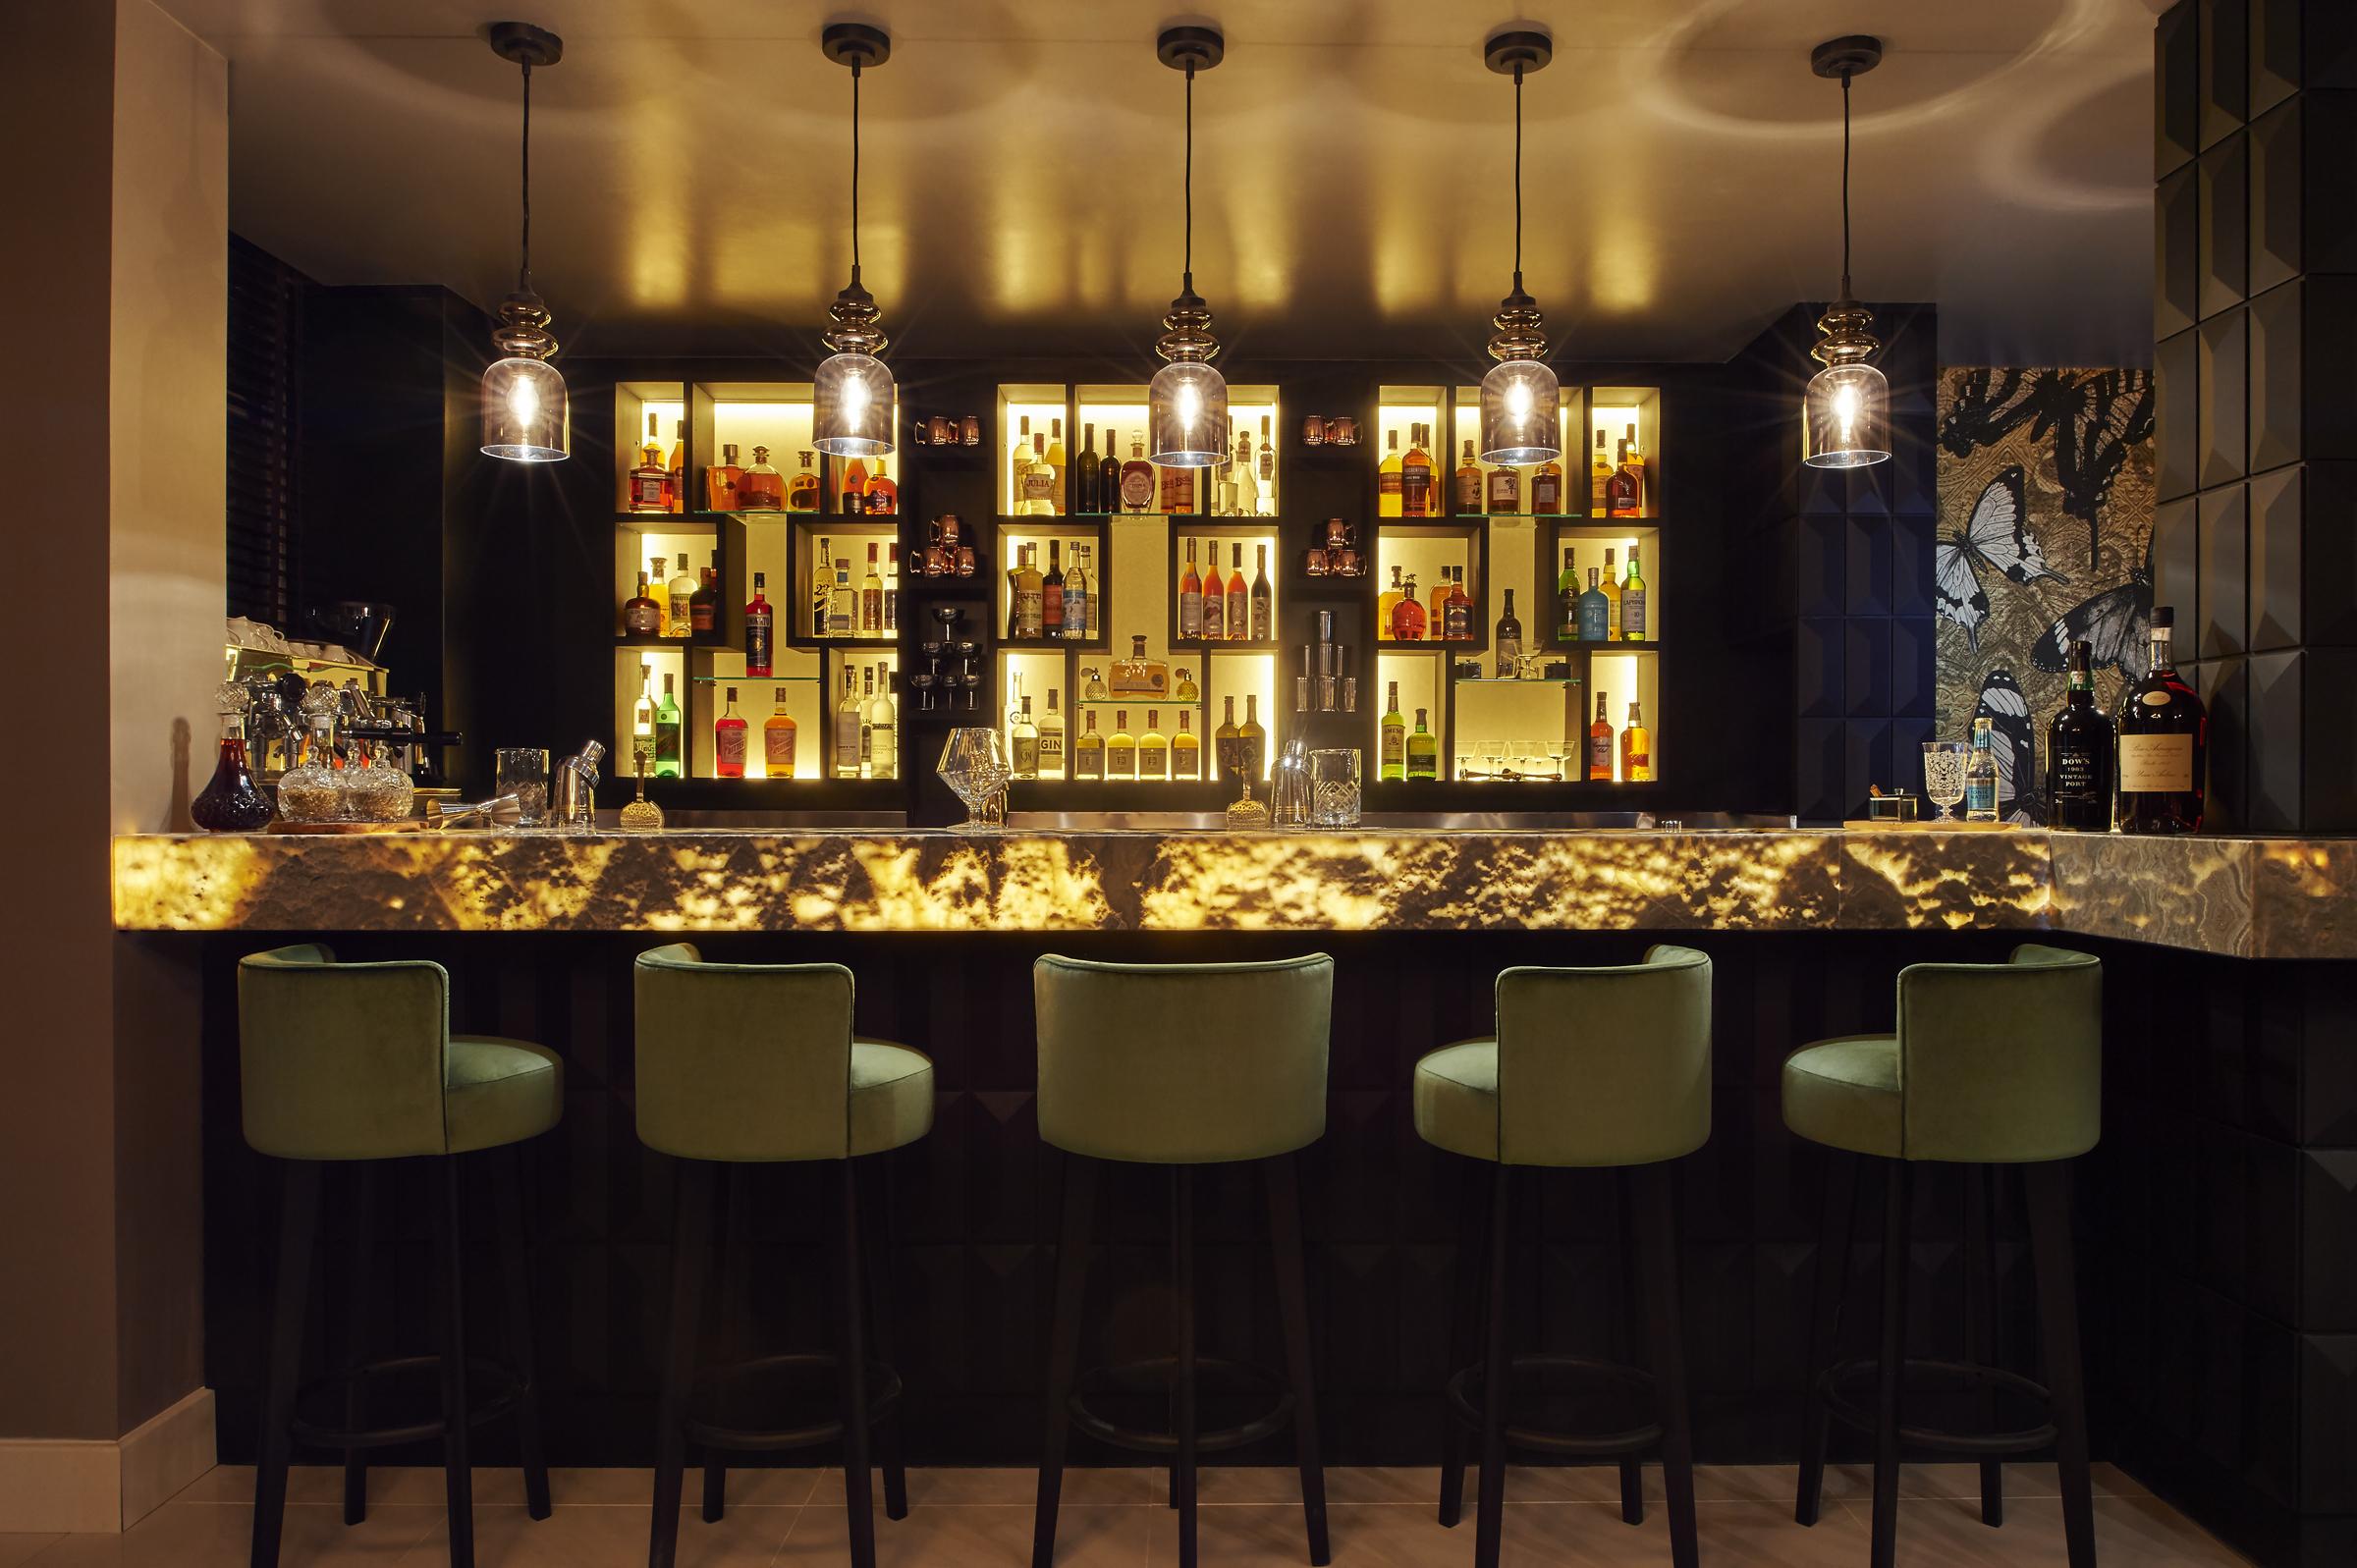 Ritorno cocktail bar